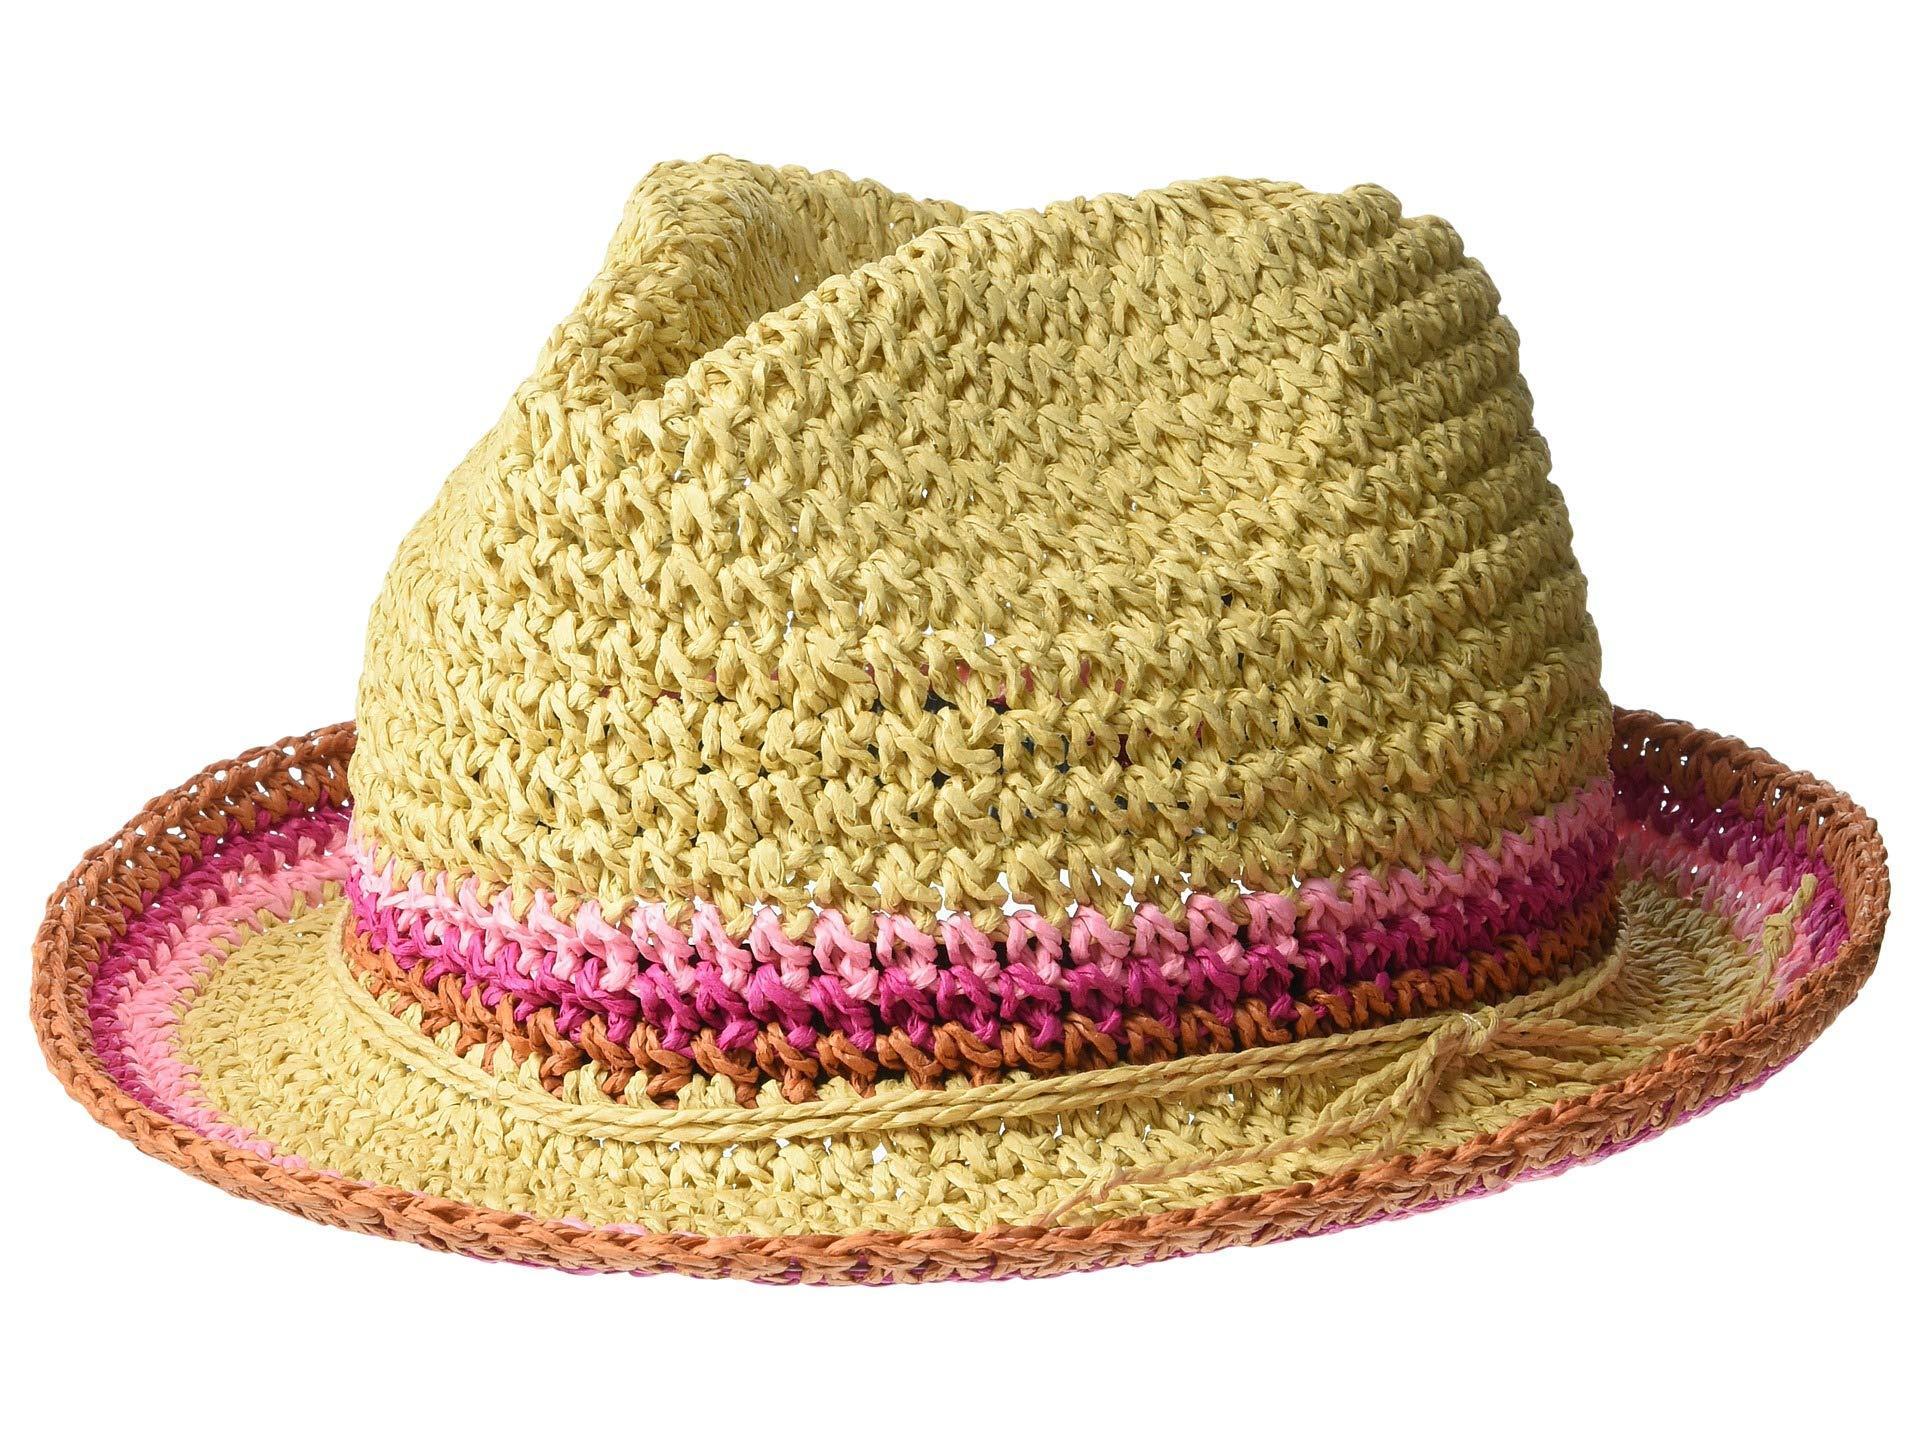 821a735857a4db Steve Madden. Women's Raffia Crochet Straw Striped Fedora (black) Fedora  Hats